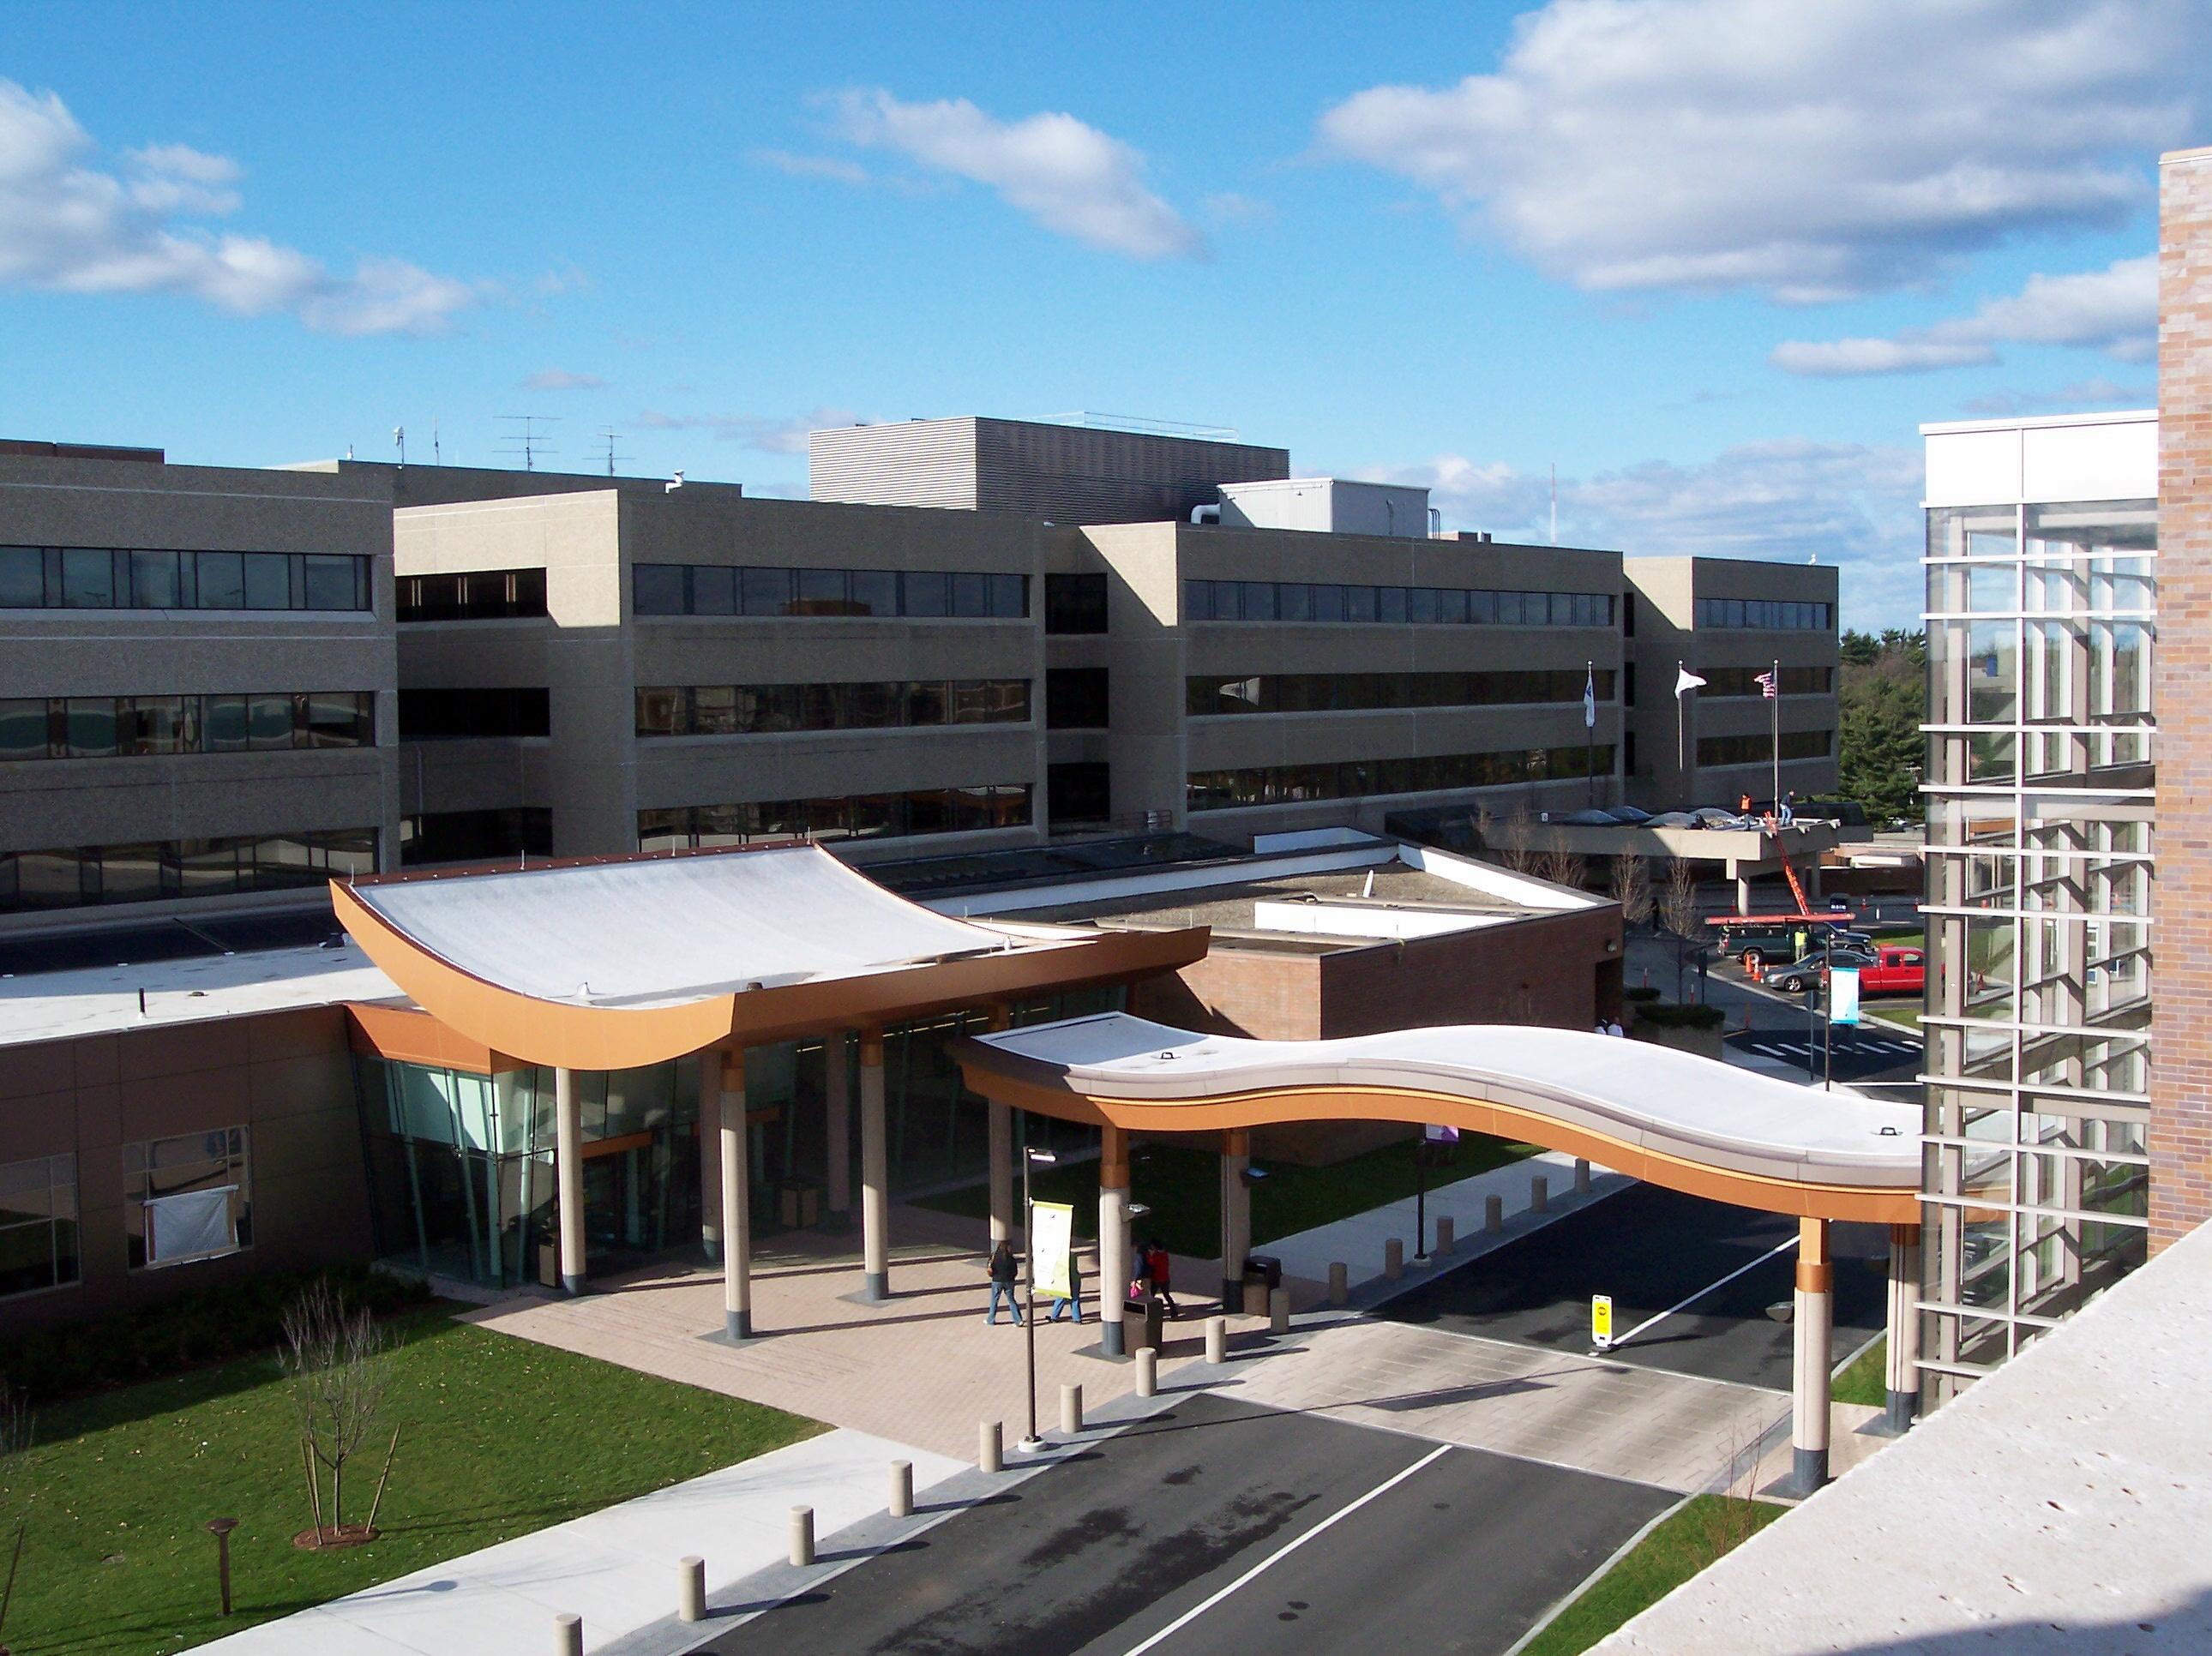 Lahey Hospital & Medical Center - Wikipedia